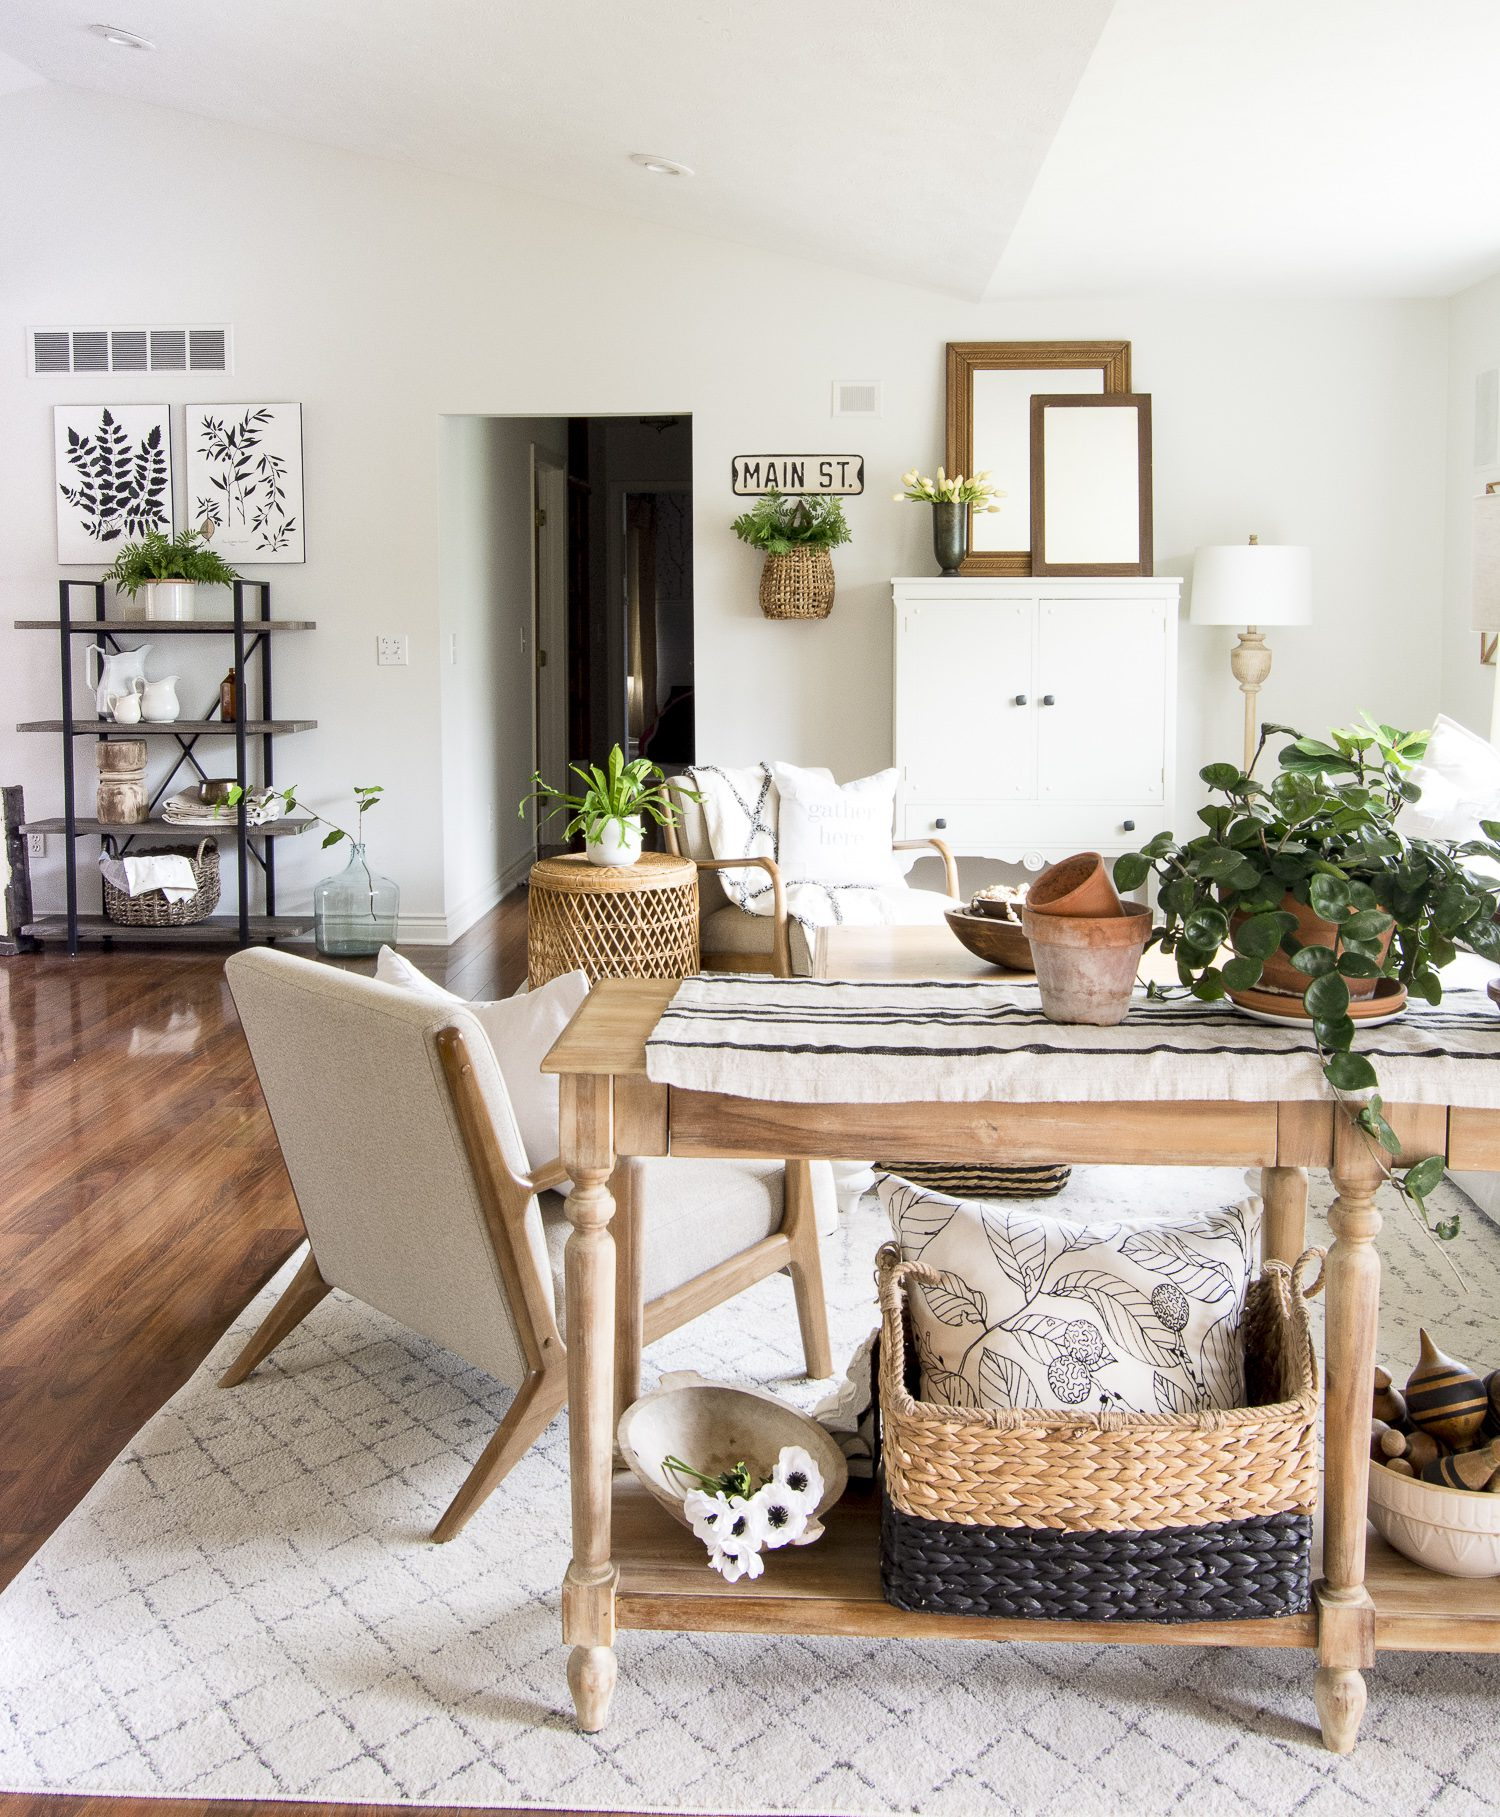 Modern Farmhouse Living Room Design Ideas #fromhousetohaven #boardandbatten #accentwall